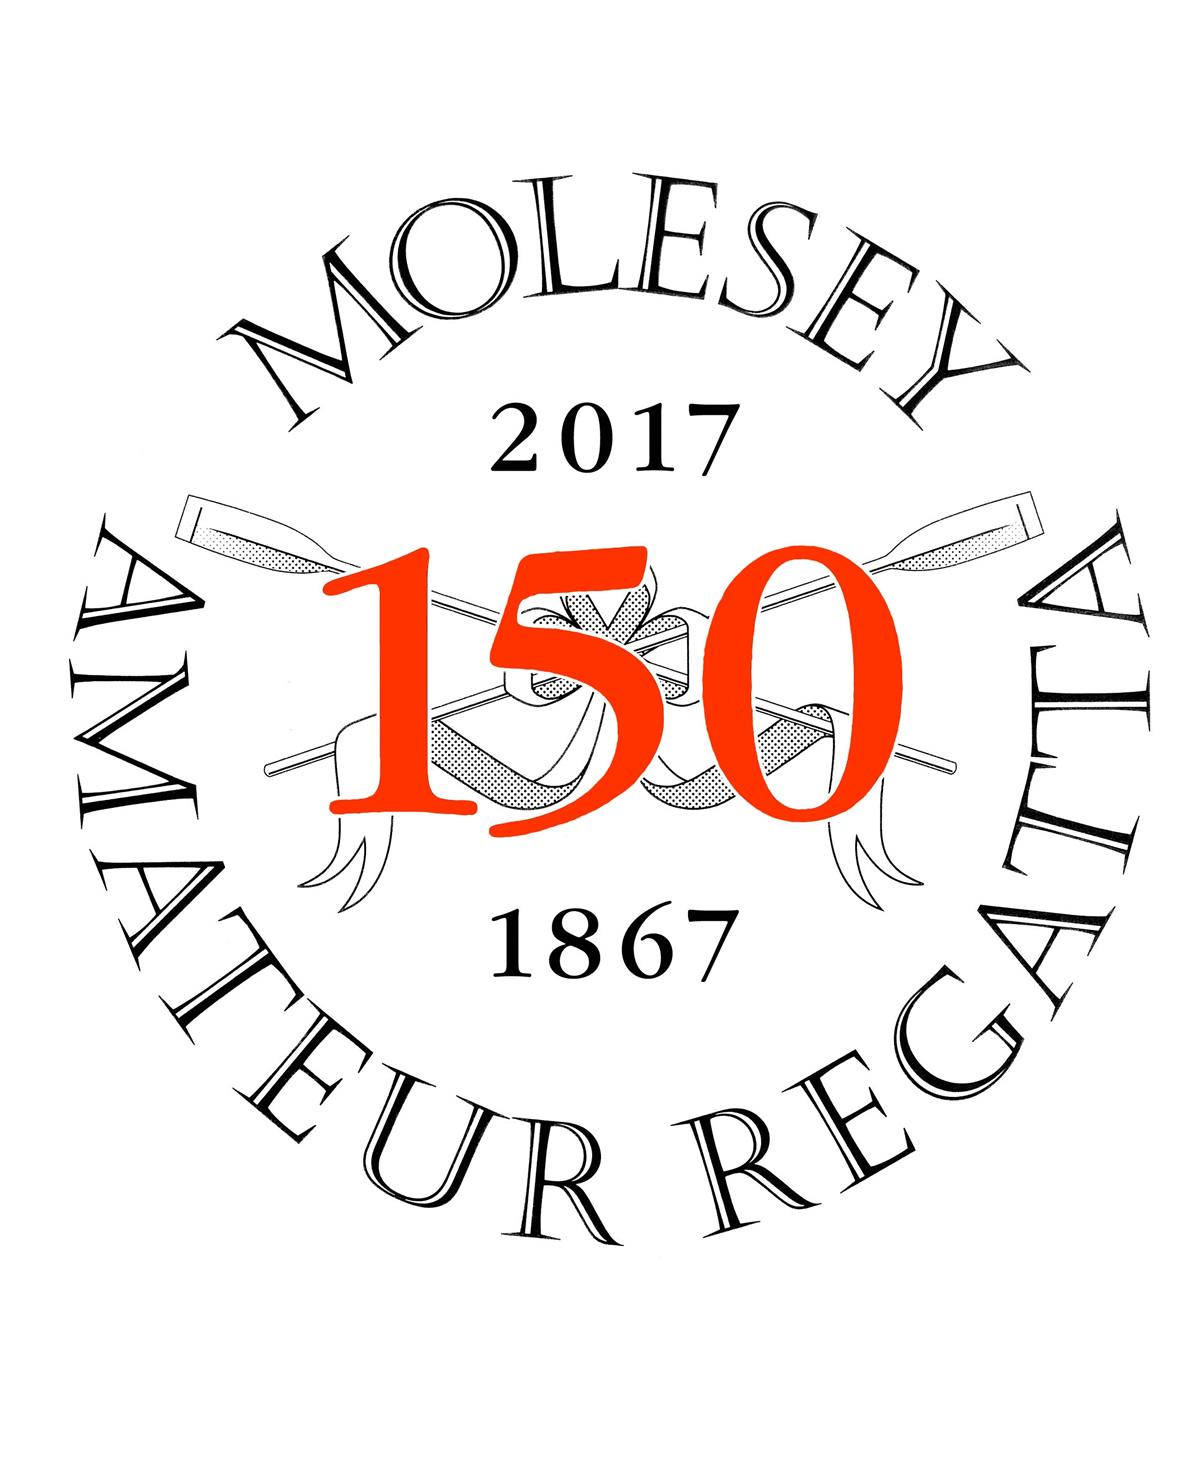 Molesey Regtatta 2017 - July 15th & 16th